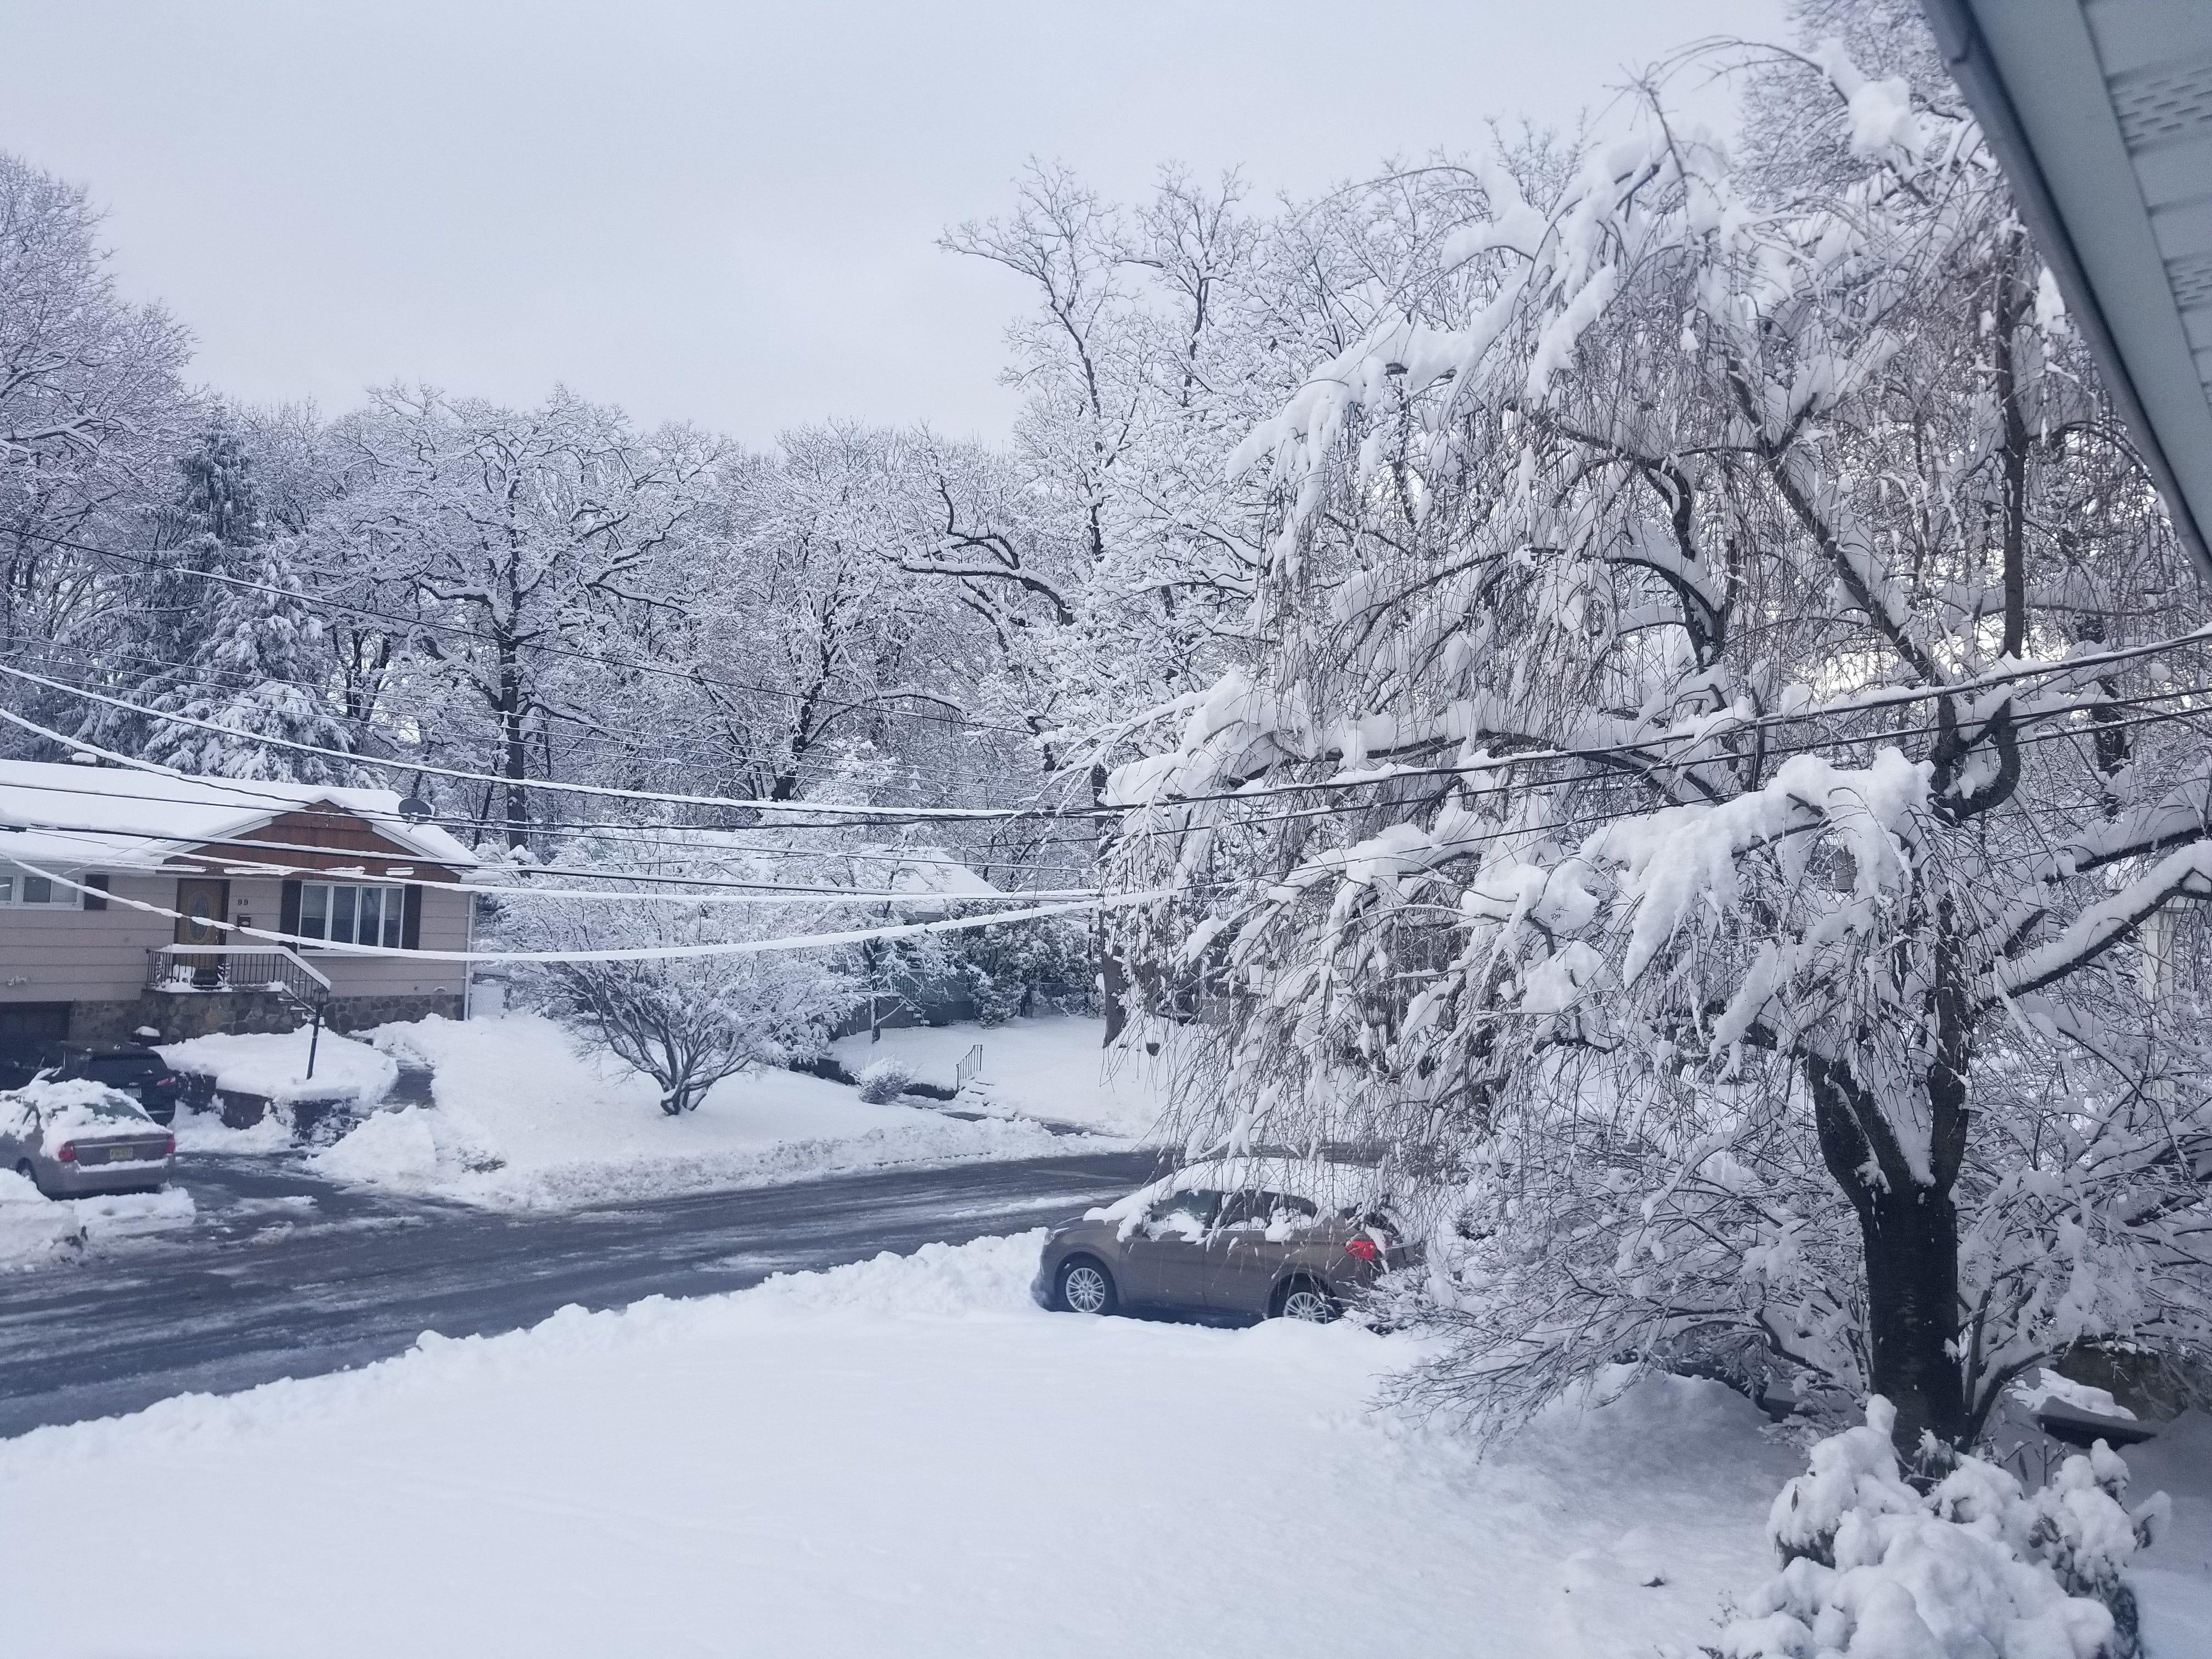 Cedar Grove residents wake up to snow along Winding Way in Cedar Grove.